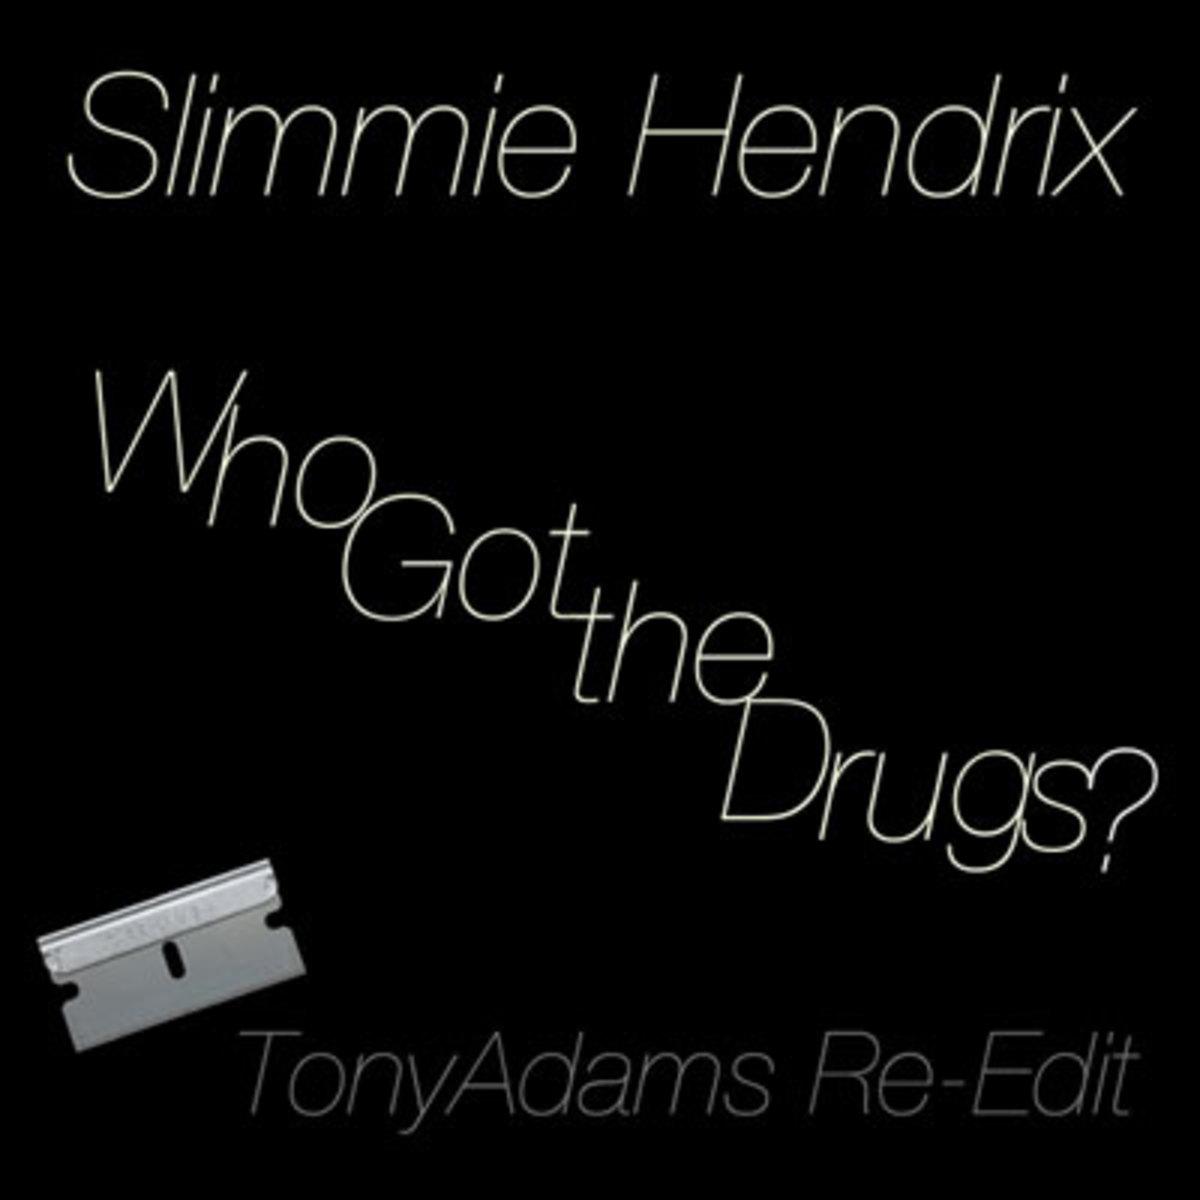 slimhendrix-whogot.jpg